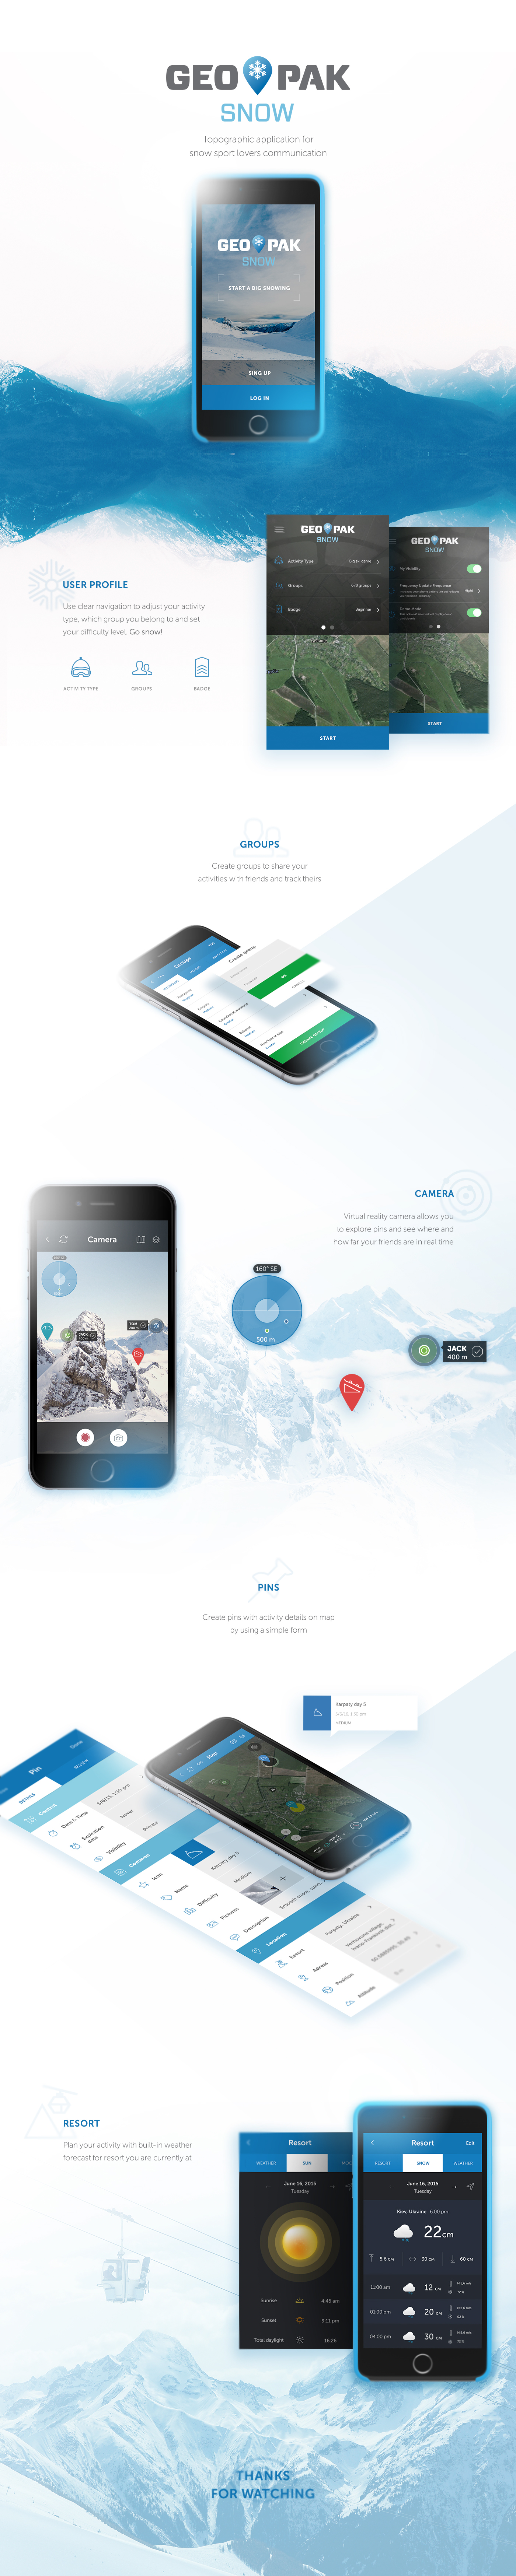 application snow sport Topographic